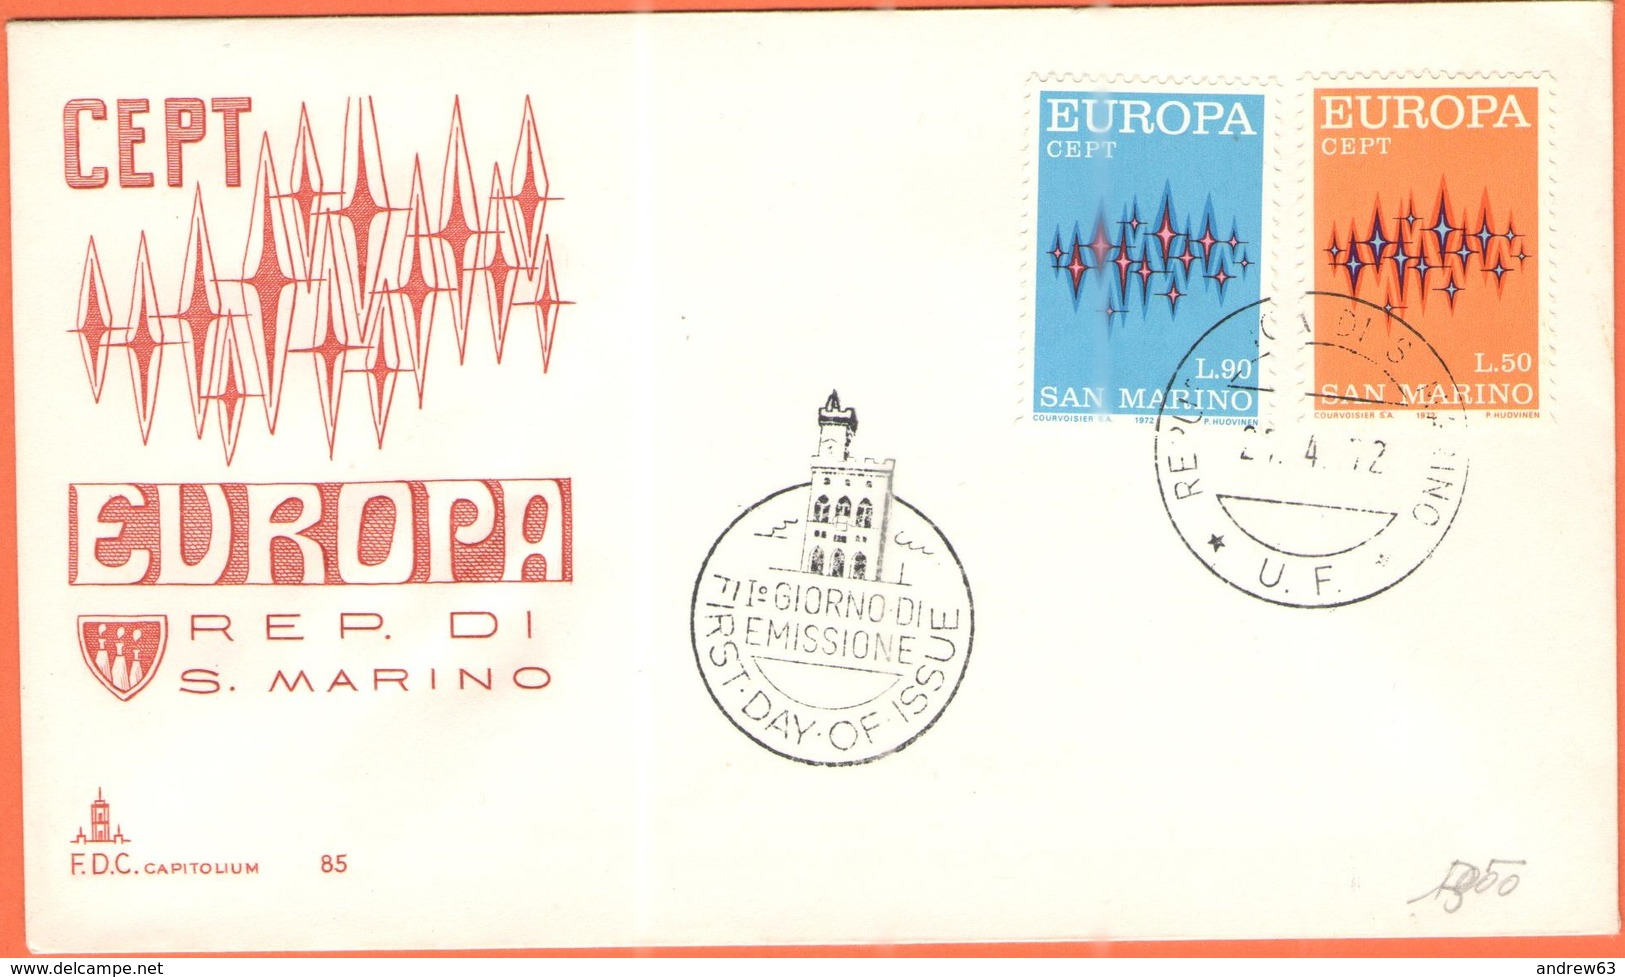 SAN MARINO - 1972 - Europa CEPT - FDC - Capitolium - 1972